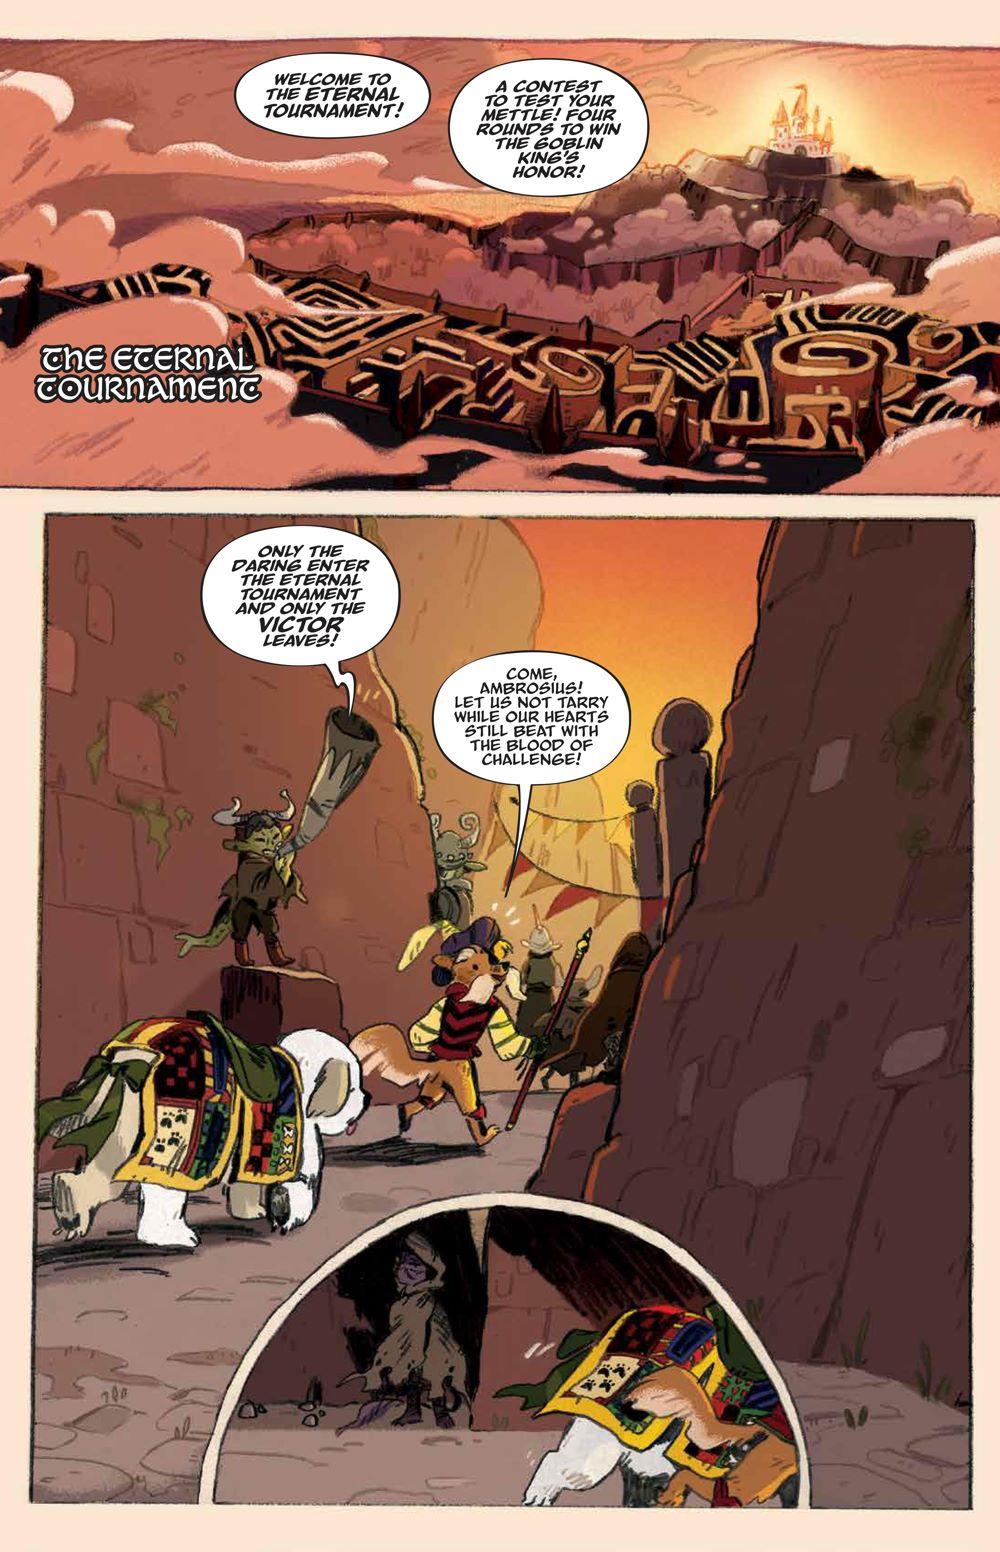 Labyrinth_UnderSpell_HC_PRESS_11 ComicList Previews: JIM HENSON'S LABYRINTH UNDER THE SPELL HC